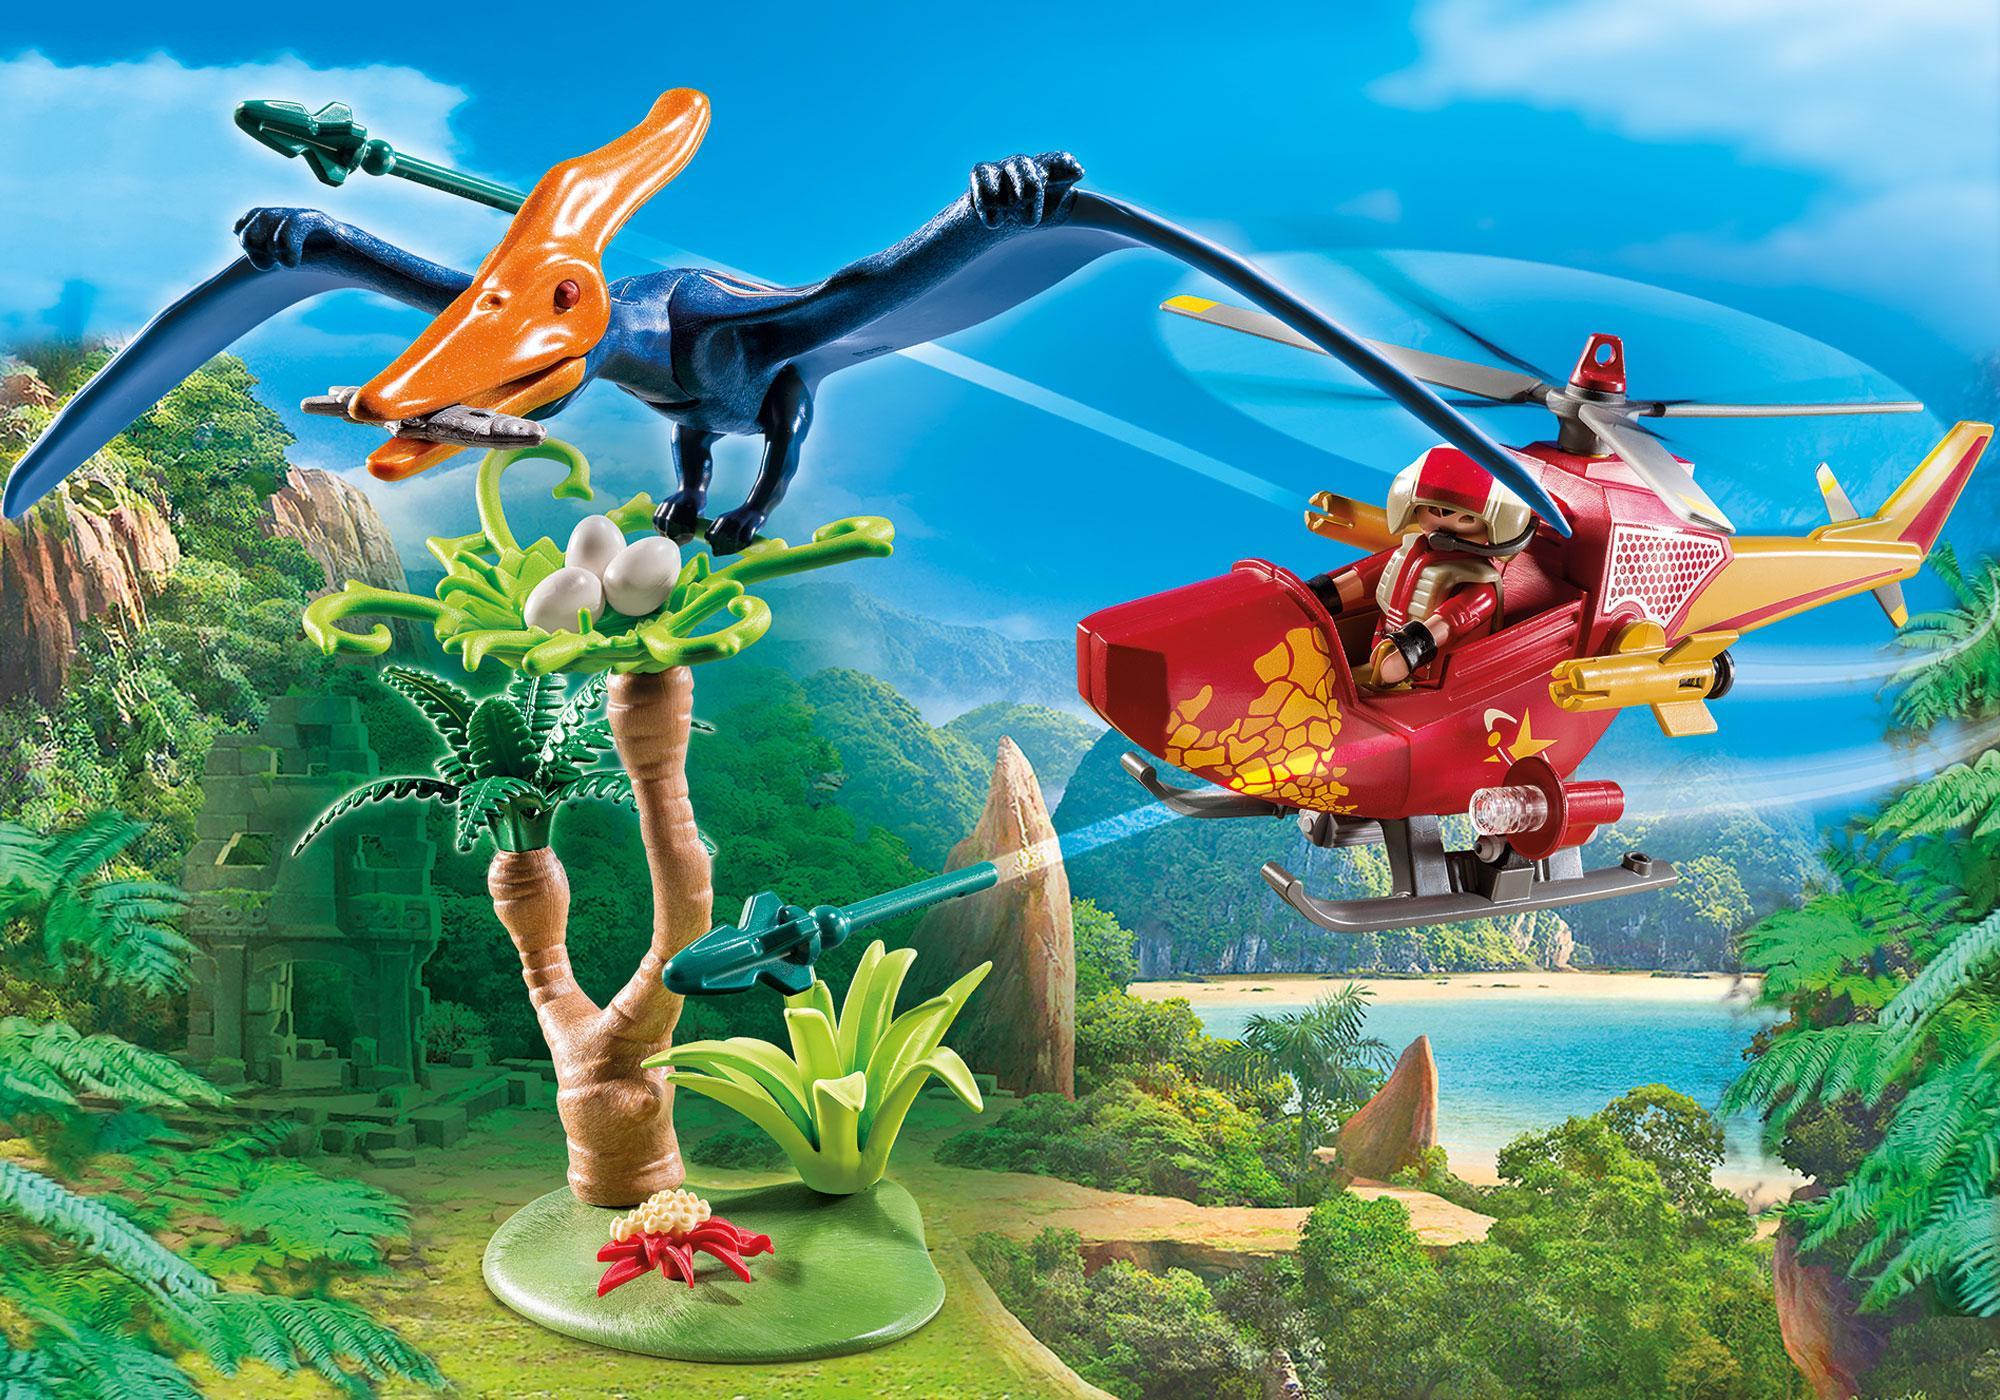 http://media.playmobil.com/i/playmobil/9430_product_detail/Helicóptero com Plesiosaurio